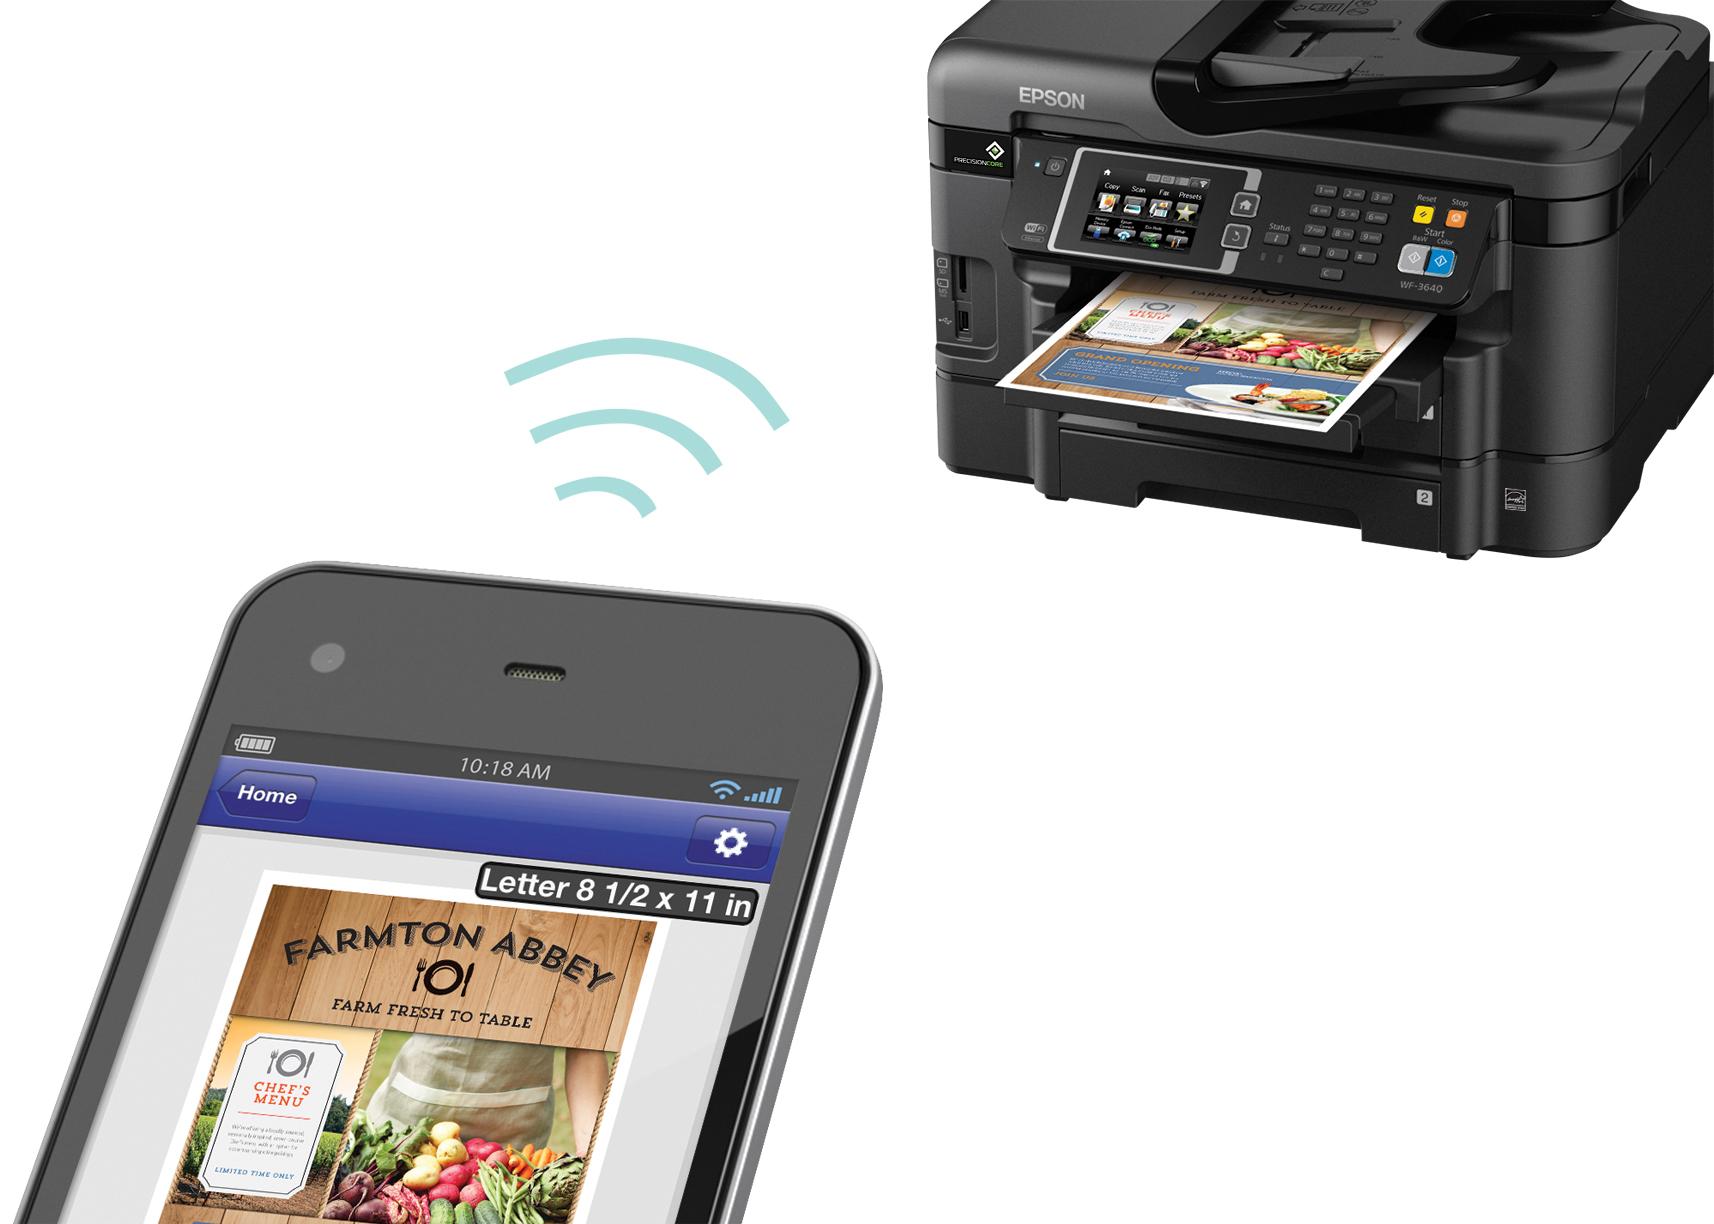 Epson-C11CD16201-WorkForce-WF-3640-All-in-One-Printer-Copier-Scanner-Fax-Machine thumbnail 4